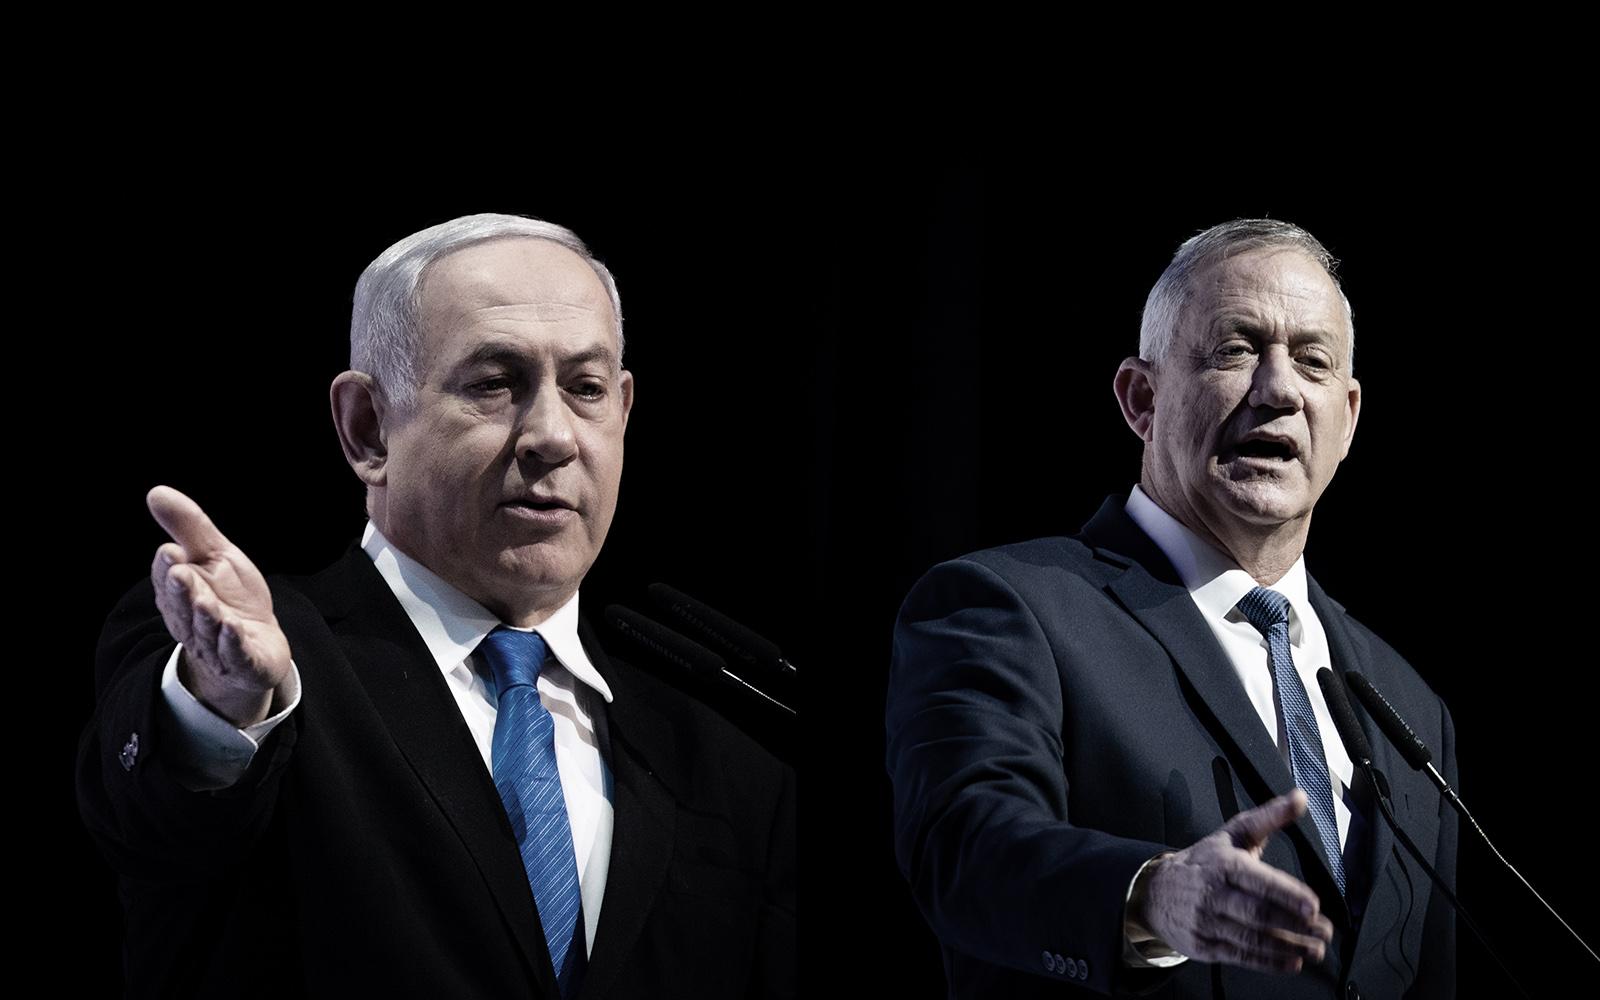 israel election results september 2020